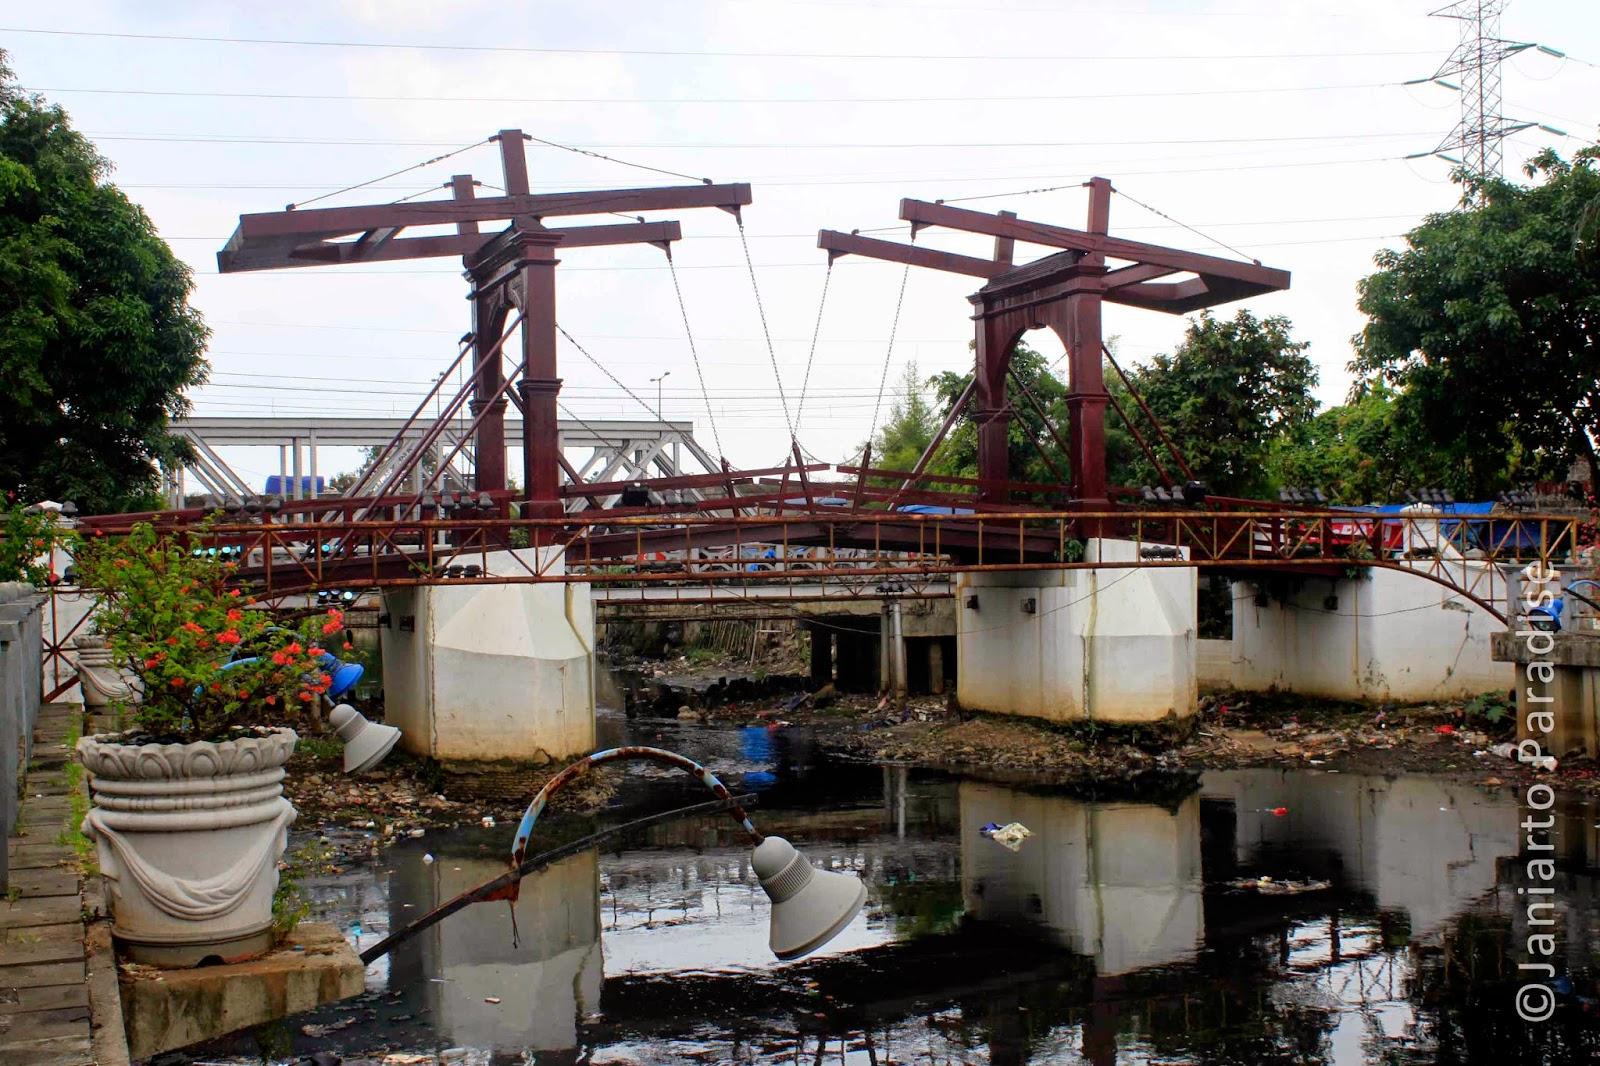 Krukut River - Jakarta Old Town